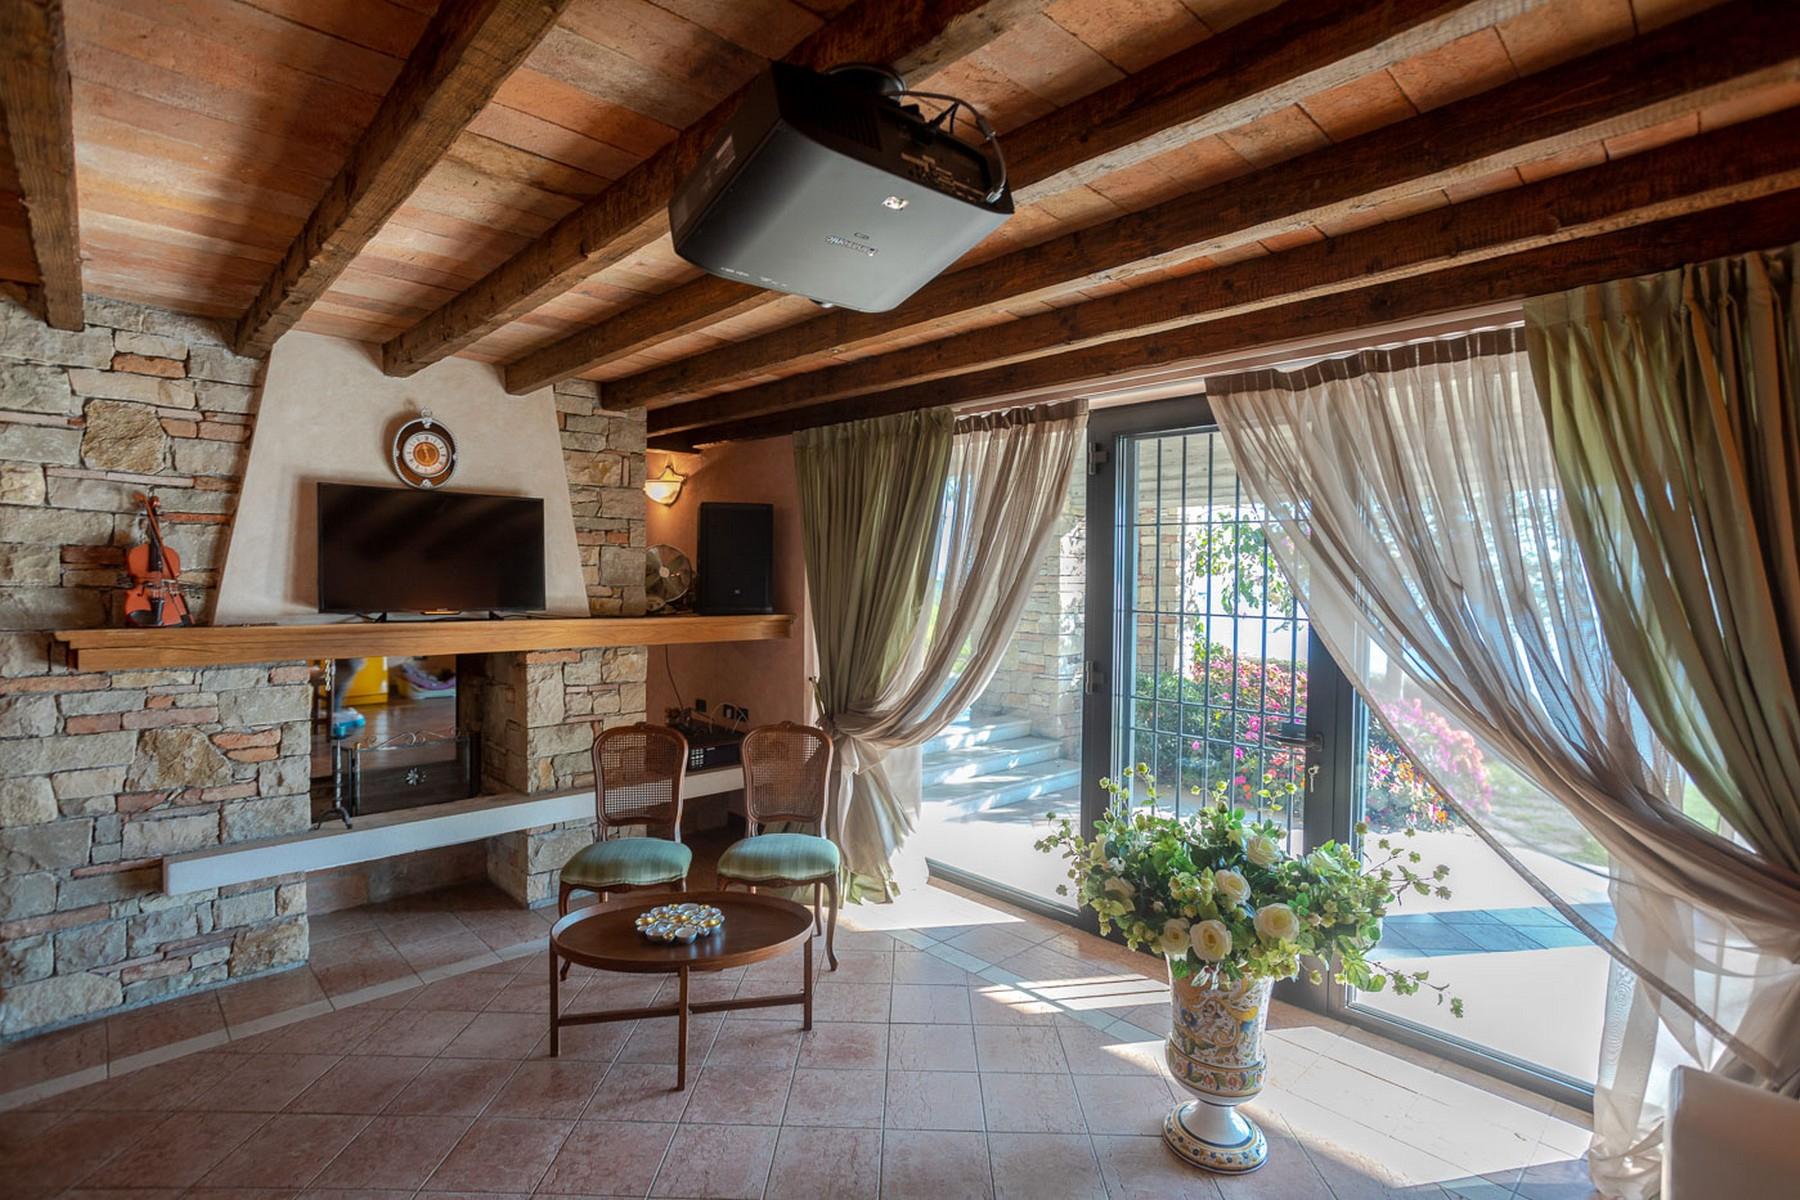 Villa in Vendita a Padenghe Sul Garda: 5 locali, 700 mq - Foto 11